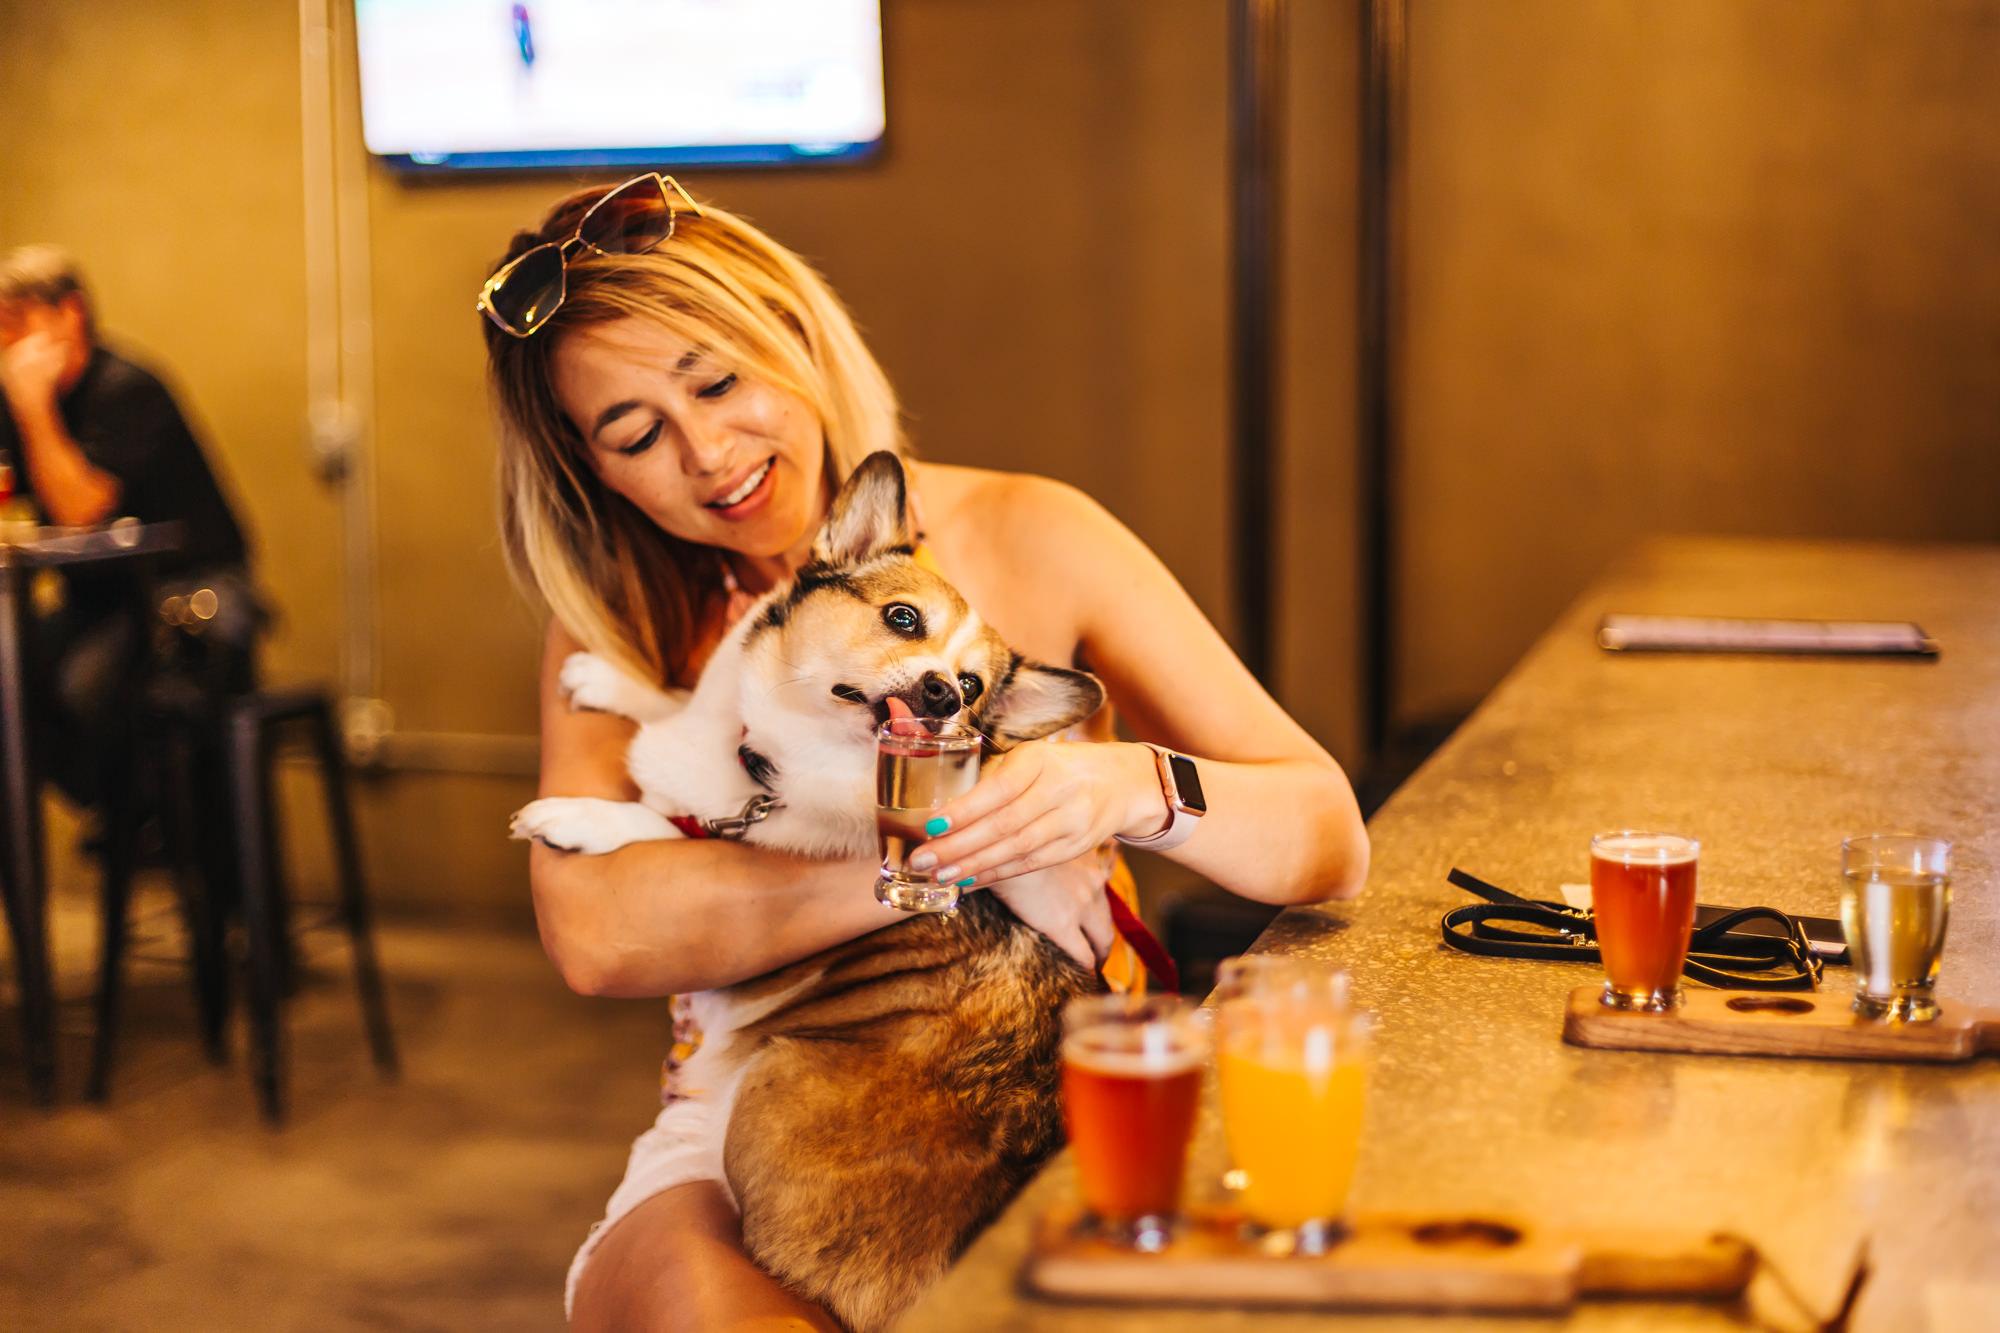 Kuma tested the non-alcoholic drinks